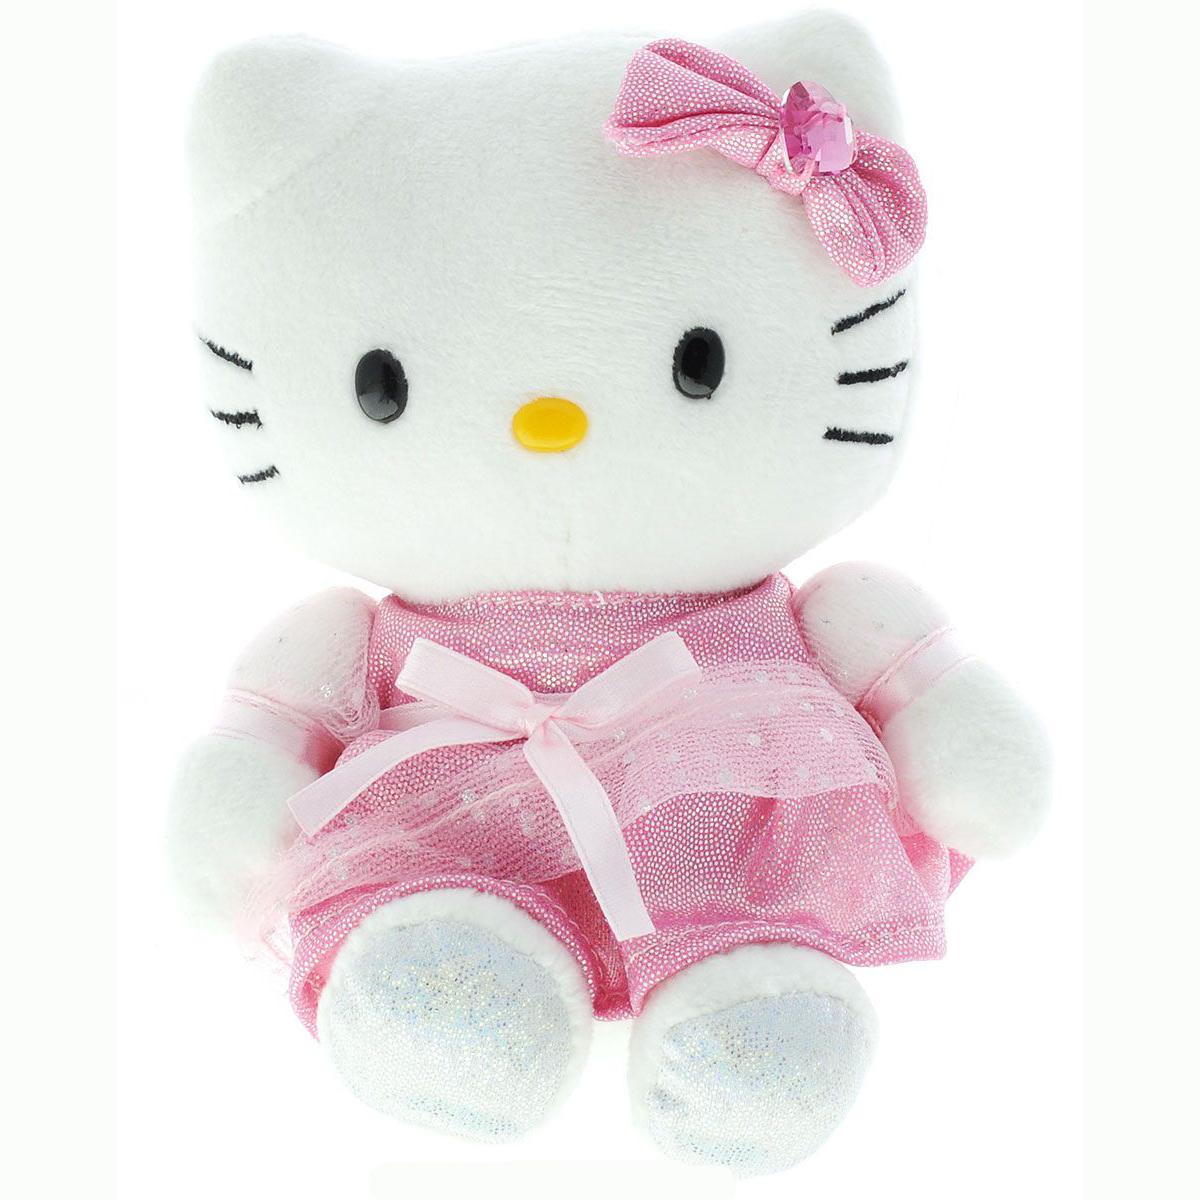 Мягкая игрушка «Хеллоу Китти», озвученная, с русским чипом, 15 см.Игрушки Hello Kitty<br>Мягкая игрушка «Хеллоу Китти», озвученная, с русским чипом, 15 см.<br>